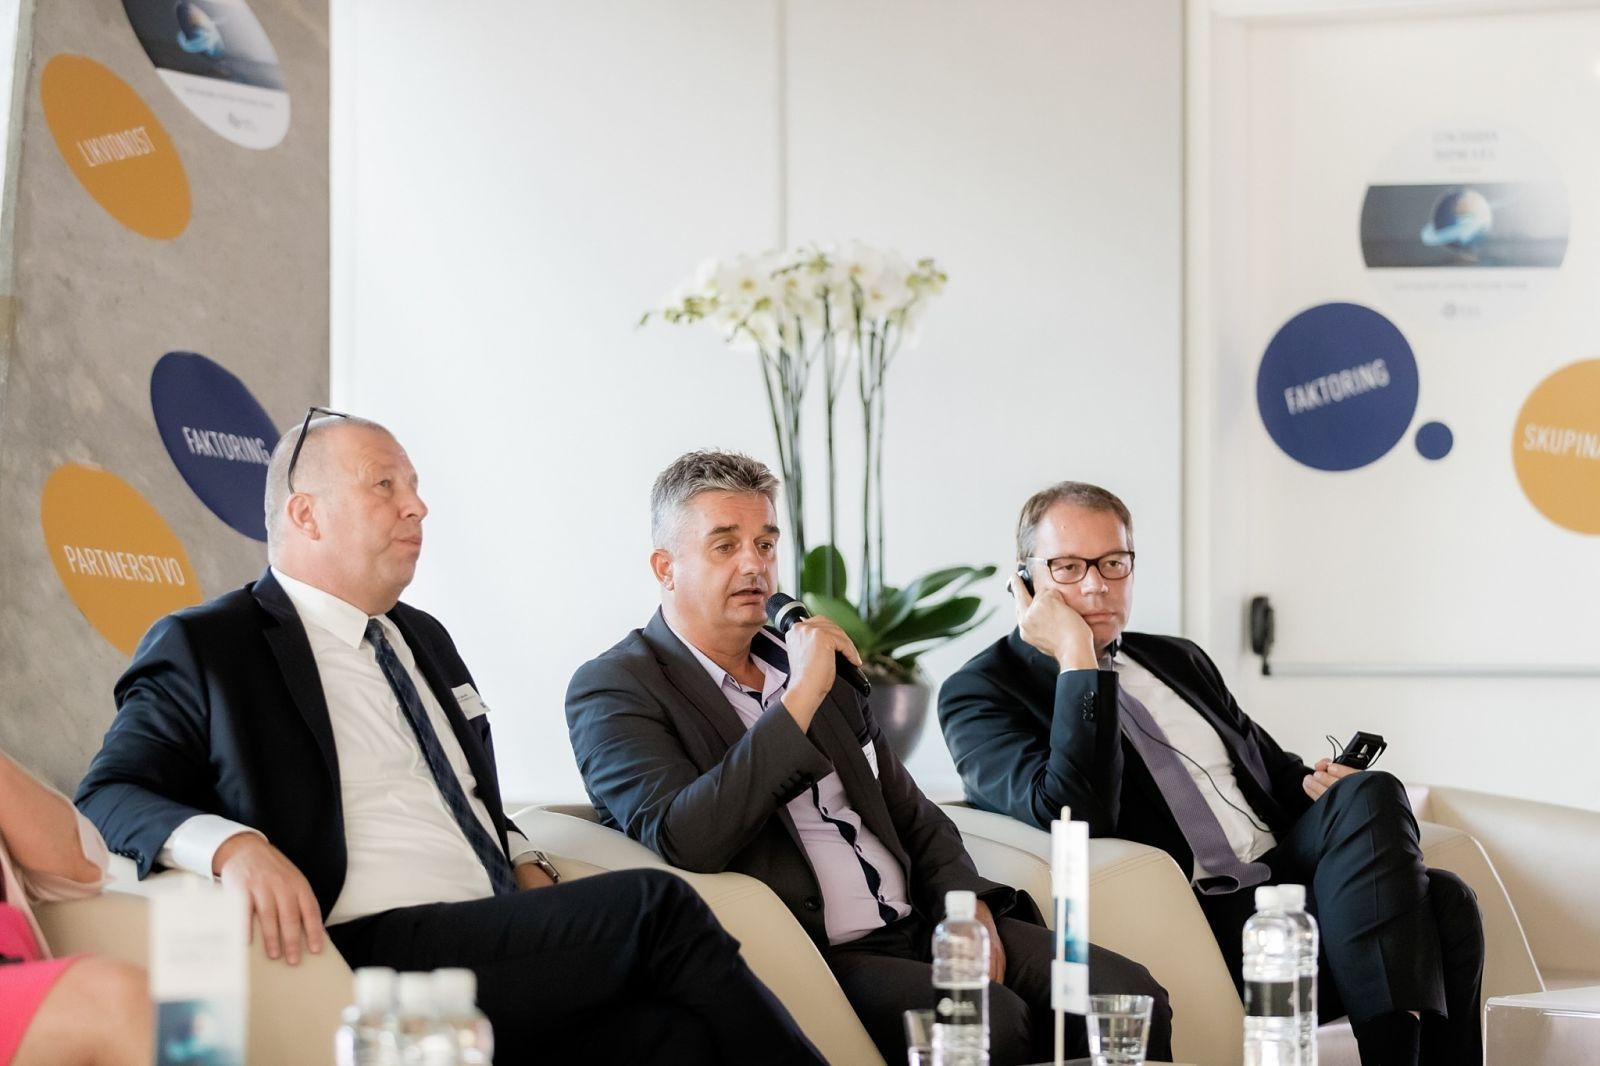 Letni dogodek Skupine A.B.S. 2019 okrogla miza: Thorsten Klindworth, Goran Novković, Davor Jakulin